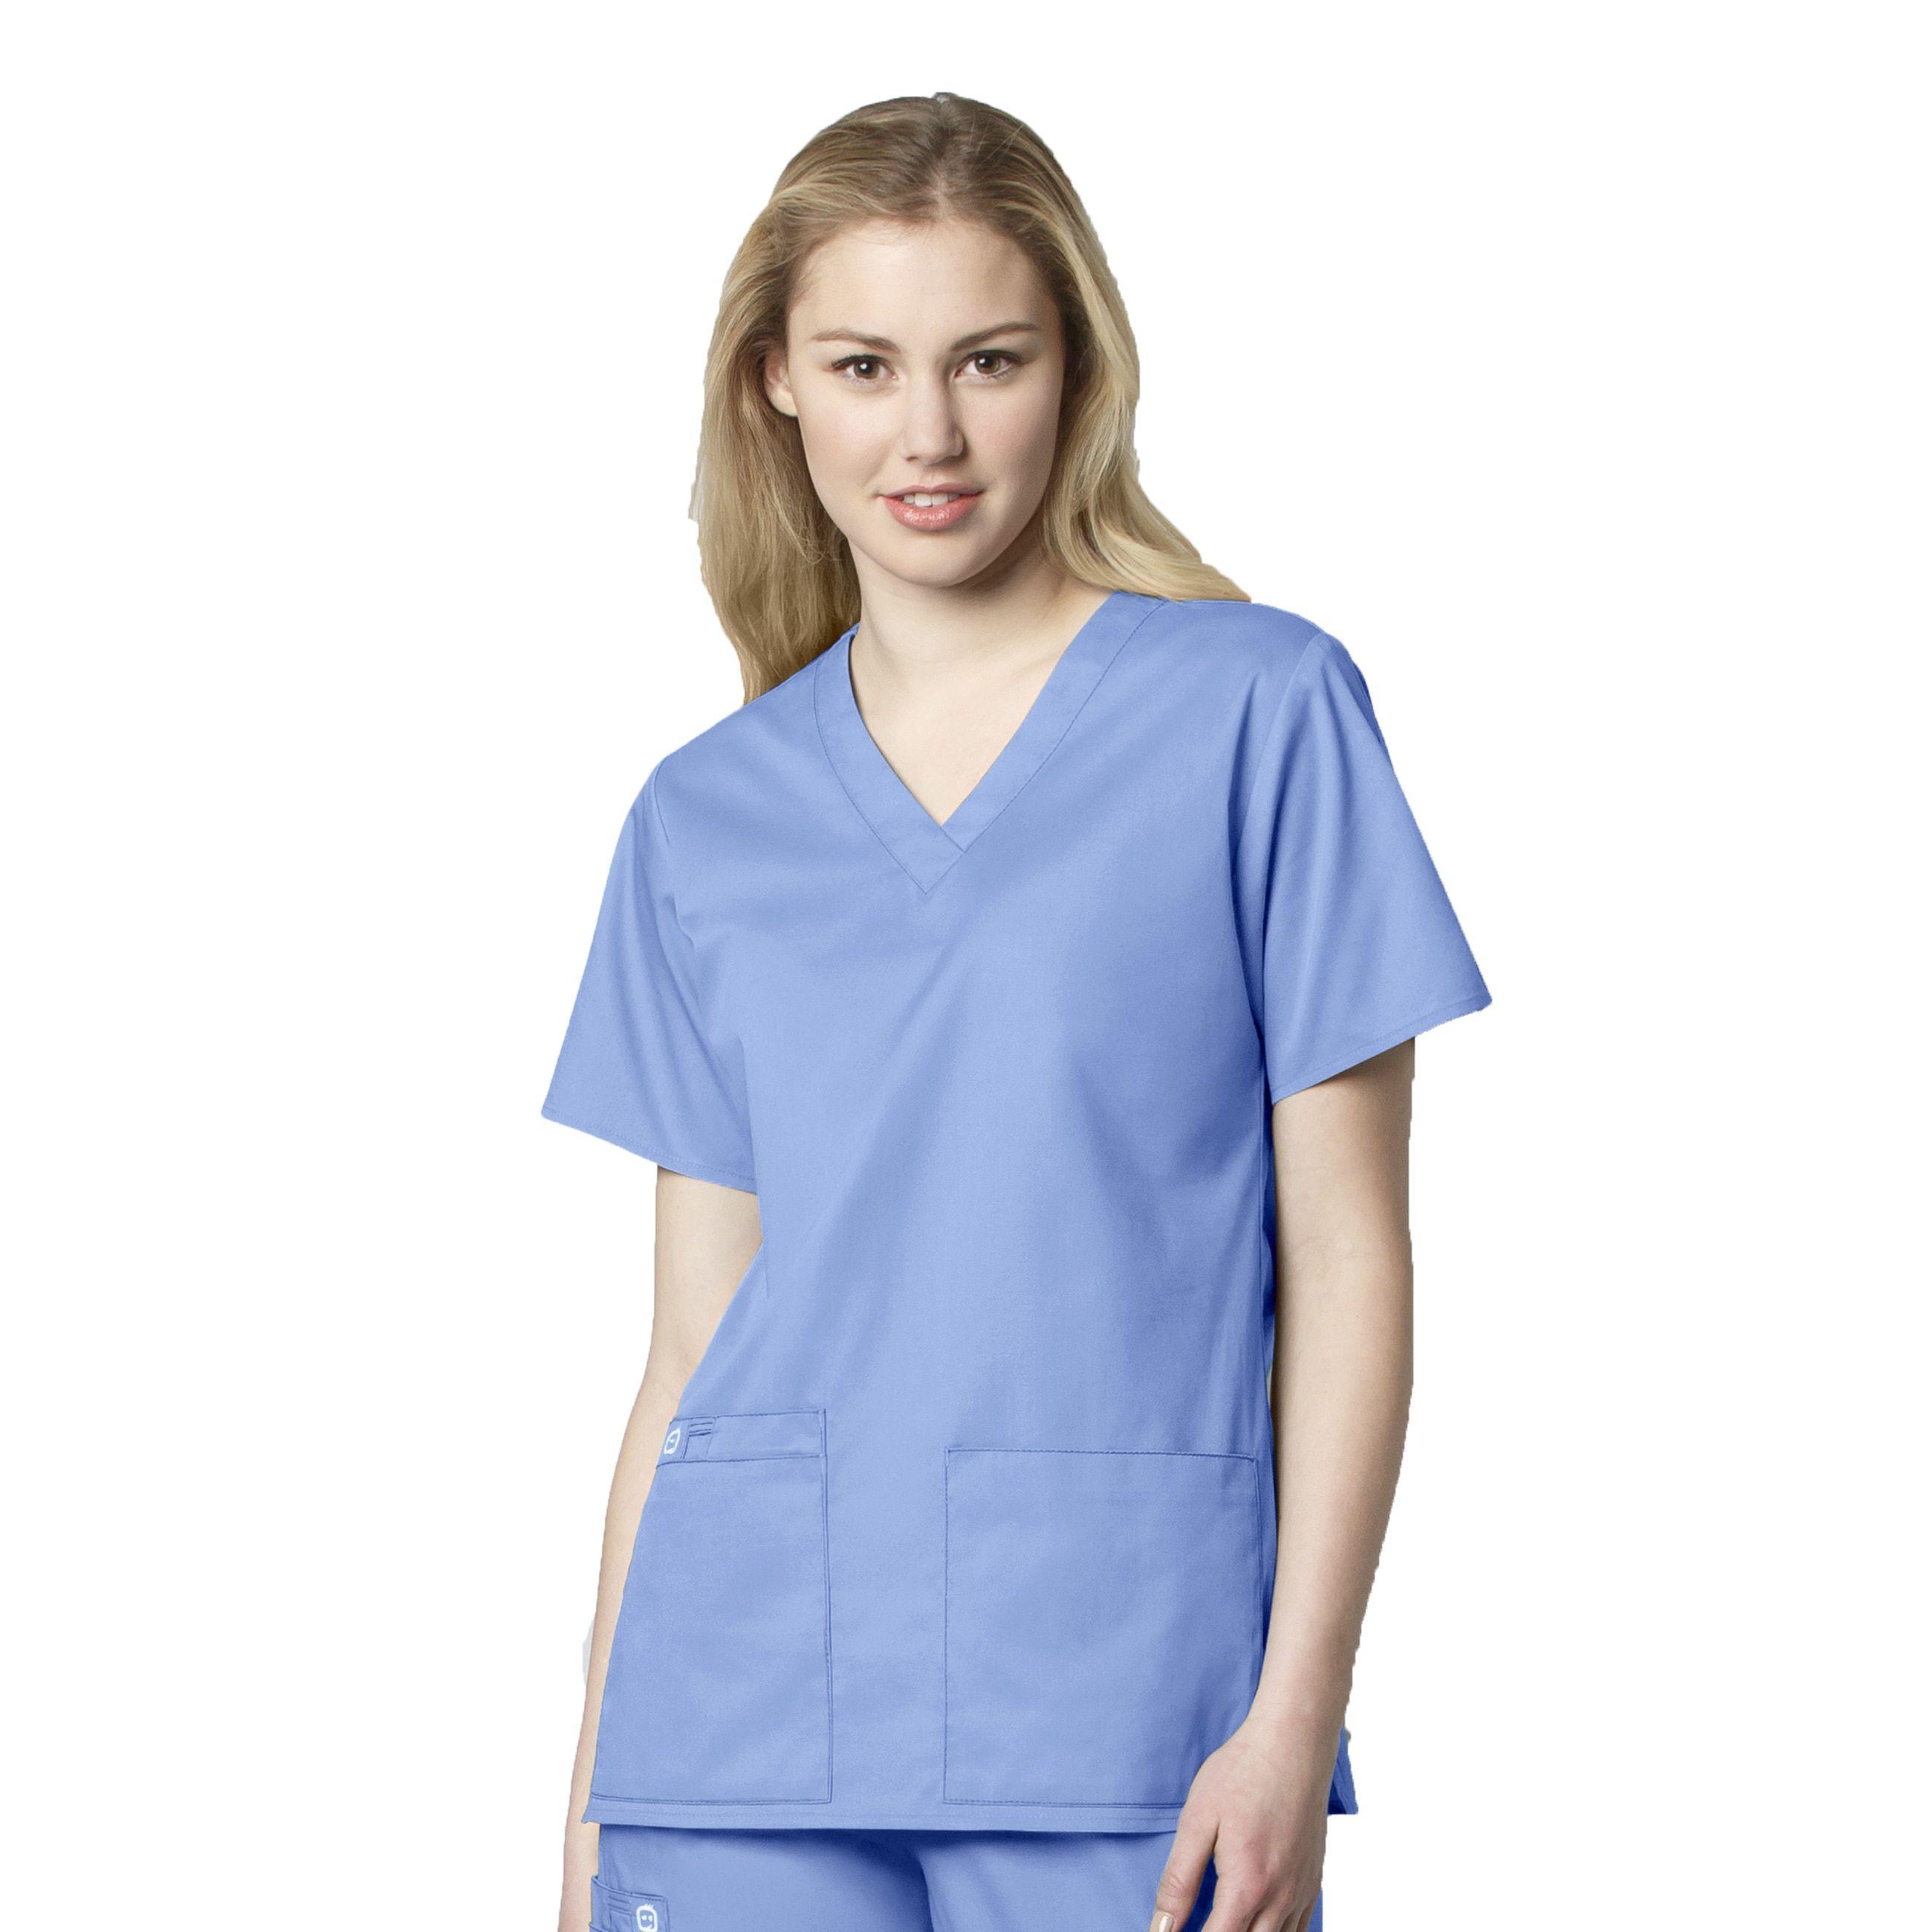 04114df4ce3 V-Neck - 101 | Products | Tops, Womens scrubs, Scrubs uniform